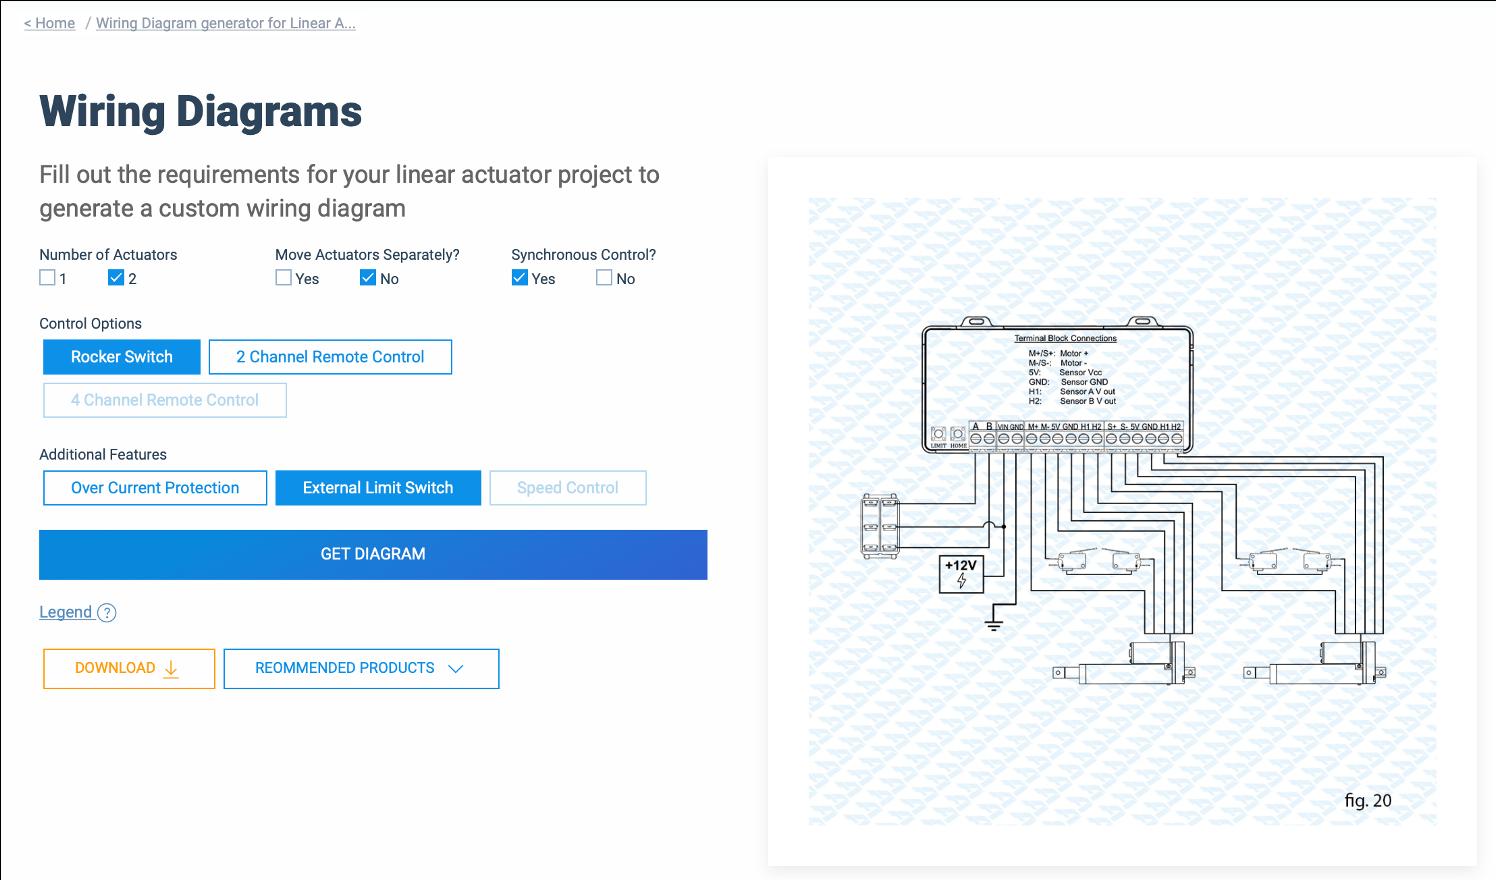 Linear Actuator Wiring Diagram Generator Firgelli